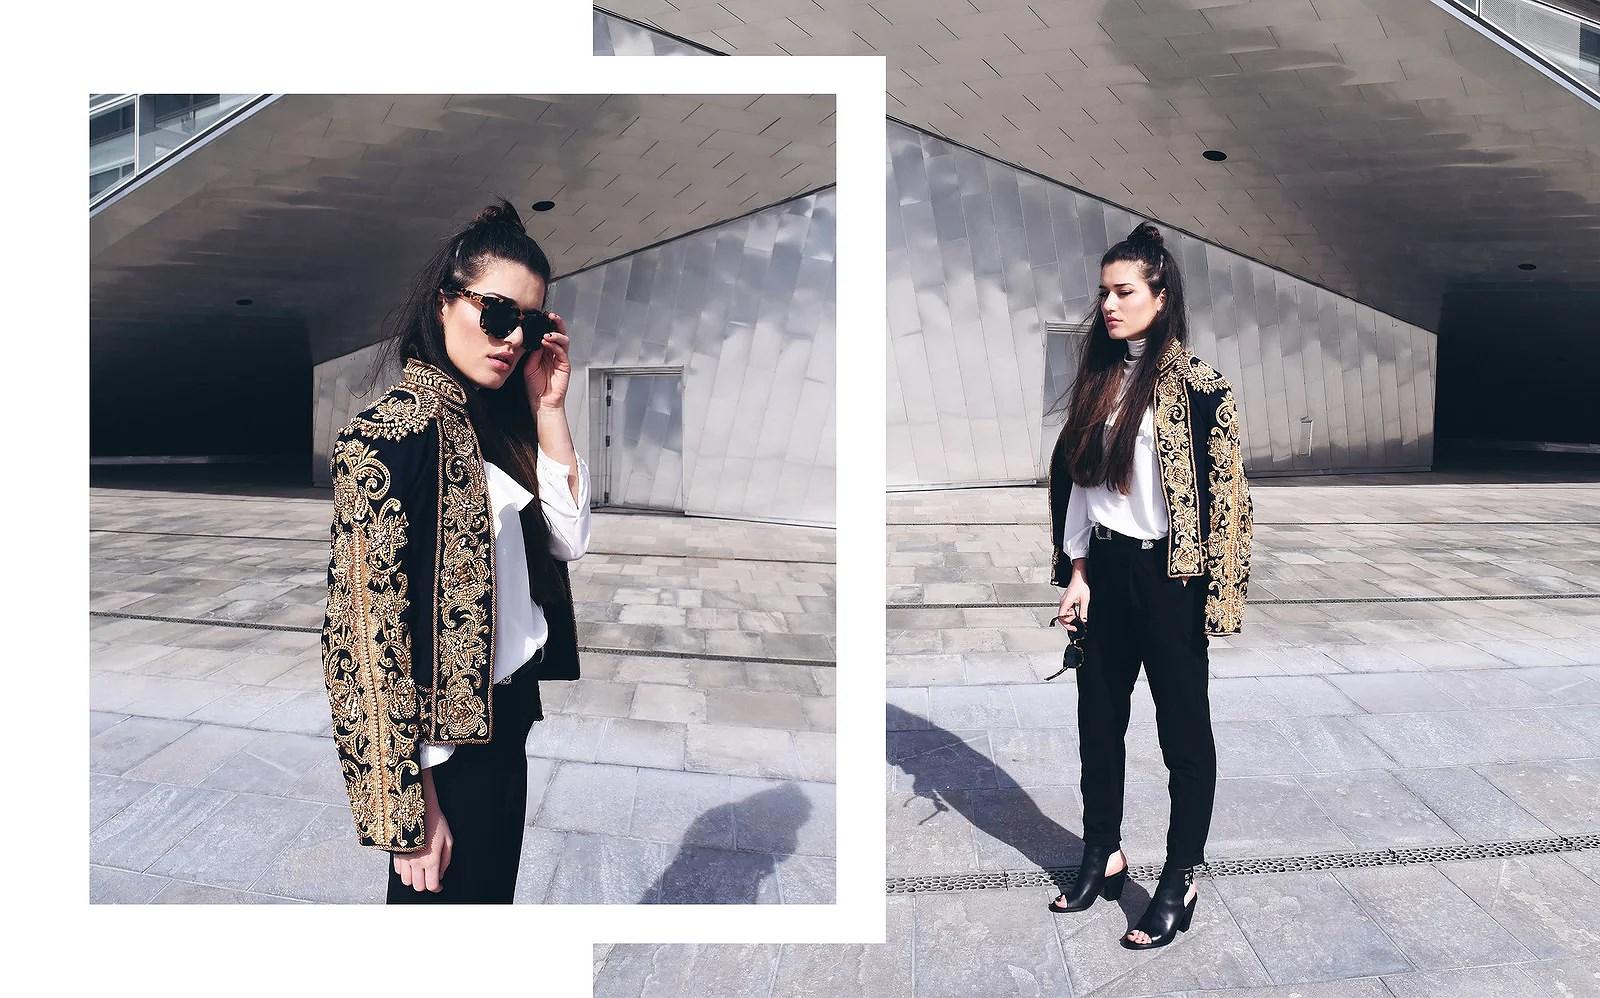 balmain inspired jacket